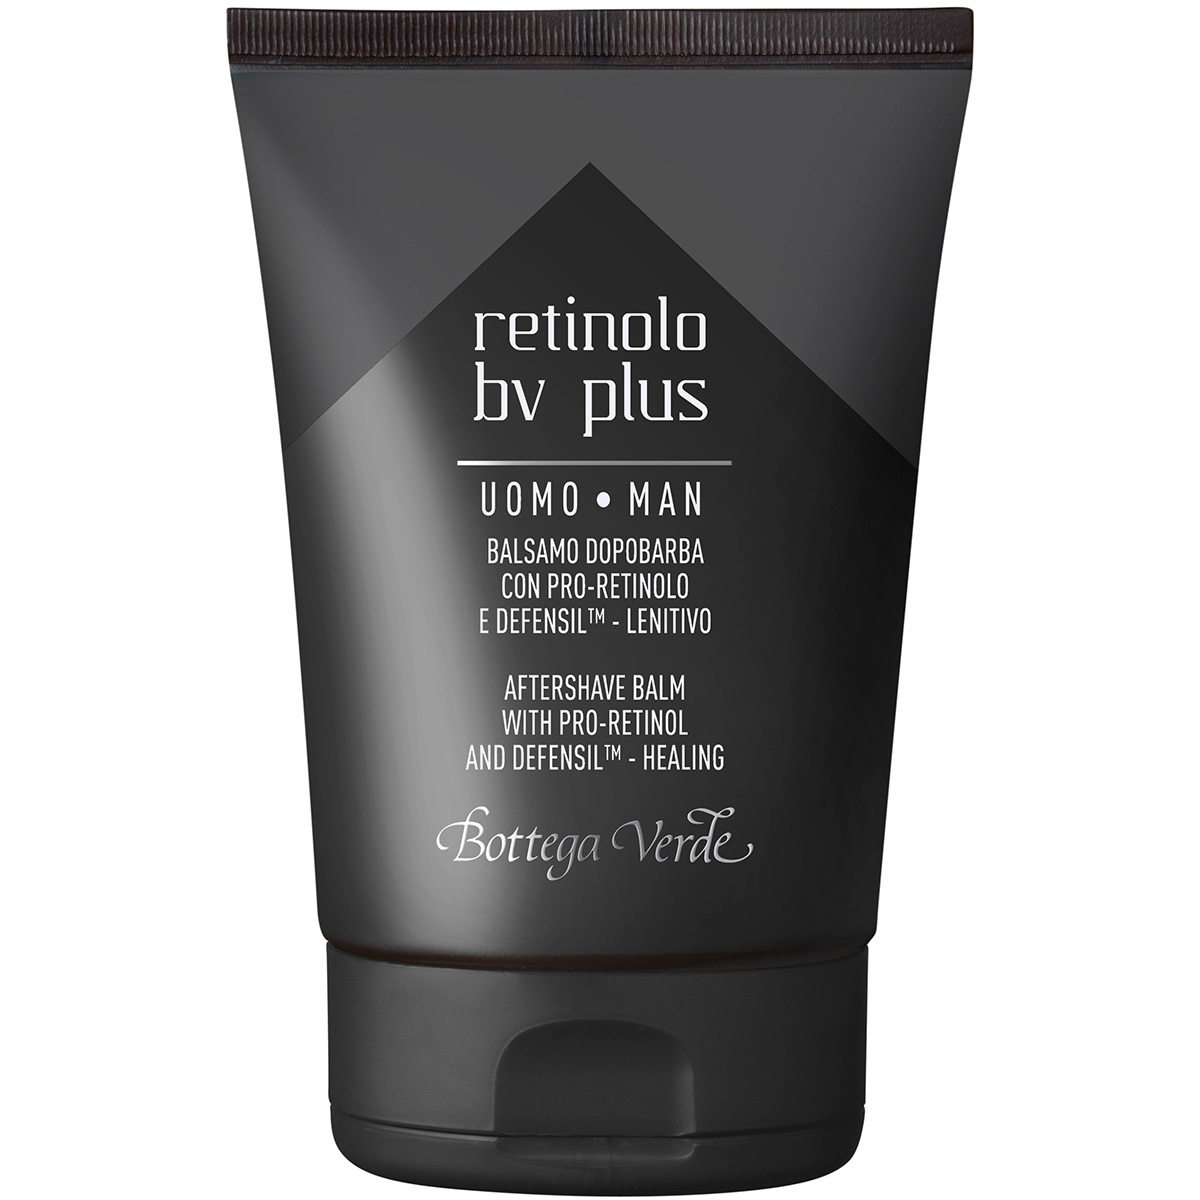 Balsam dupa barbierit, cu pro-retinol si defensil - Retinolo Bv Plus, 75 ML